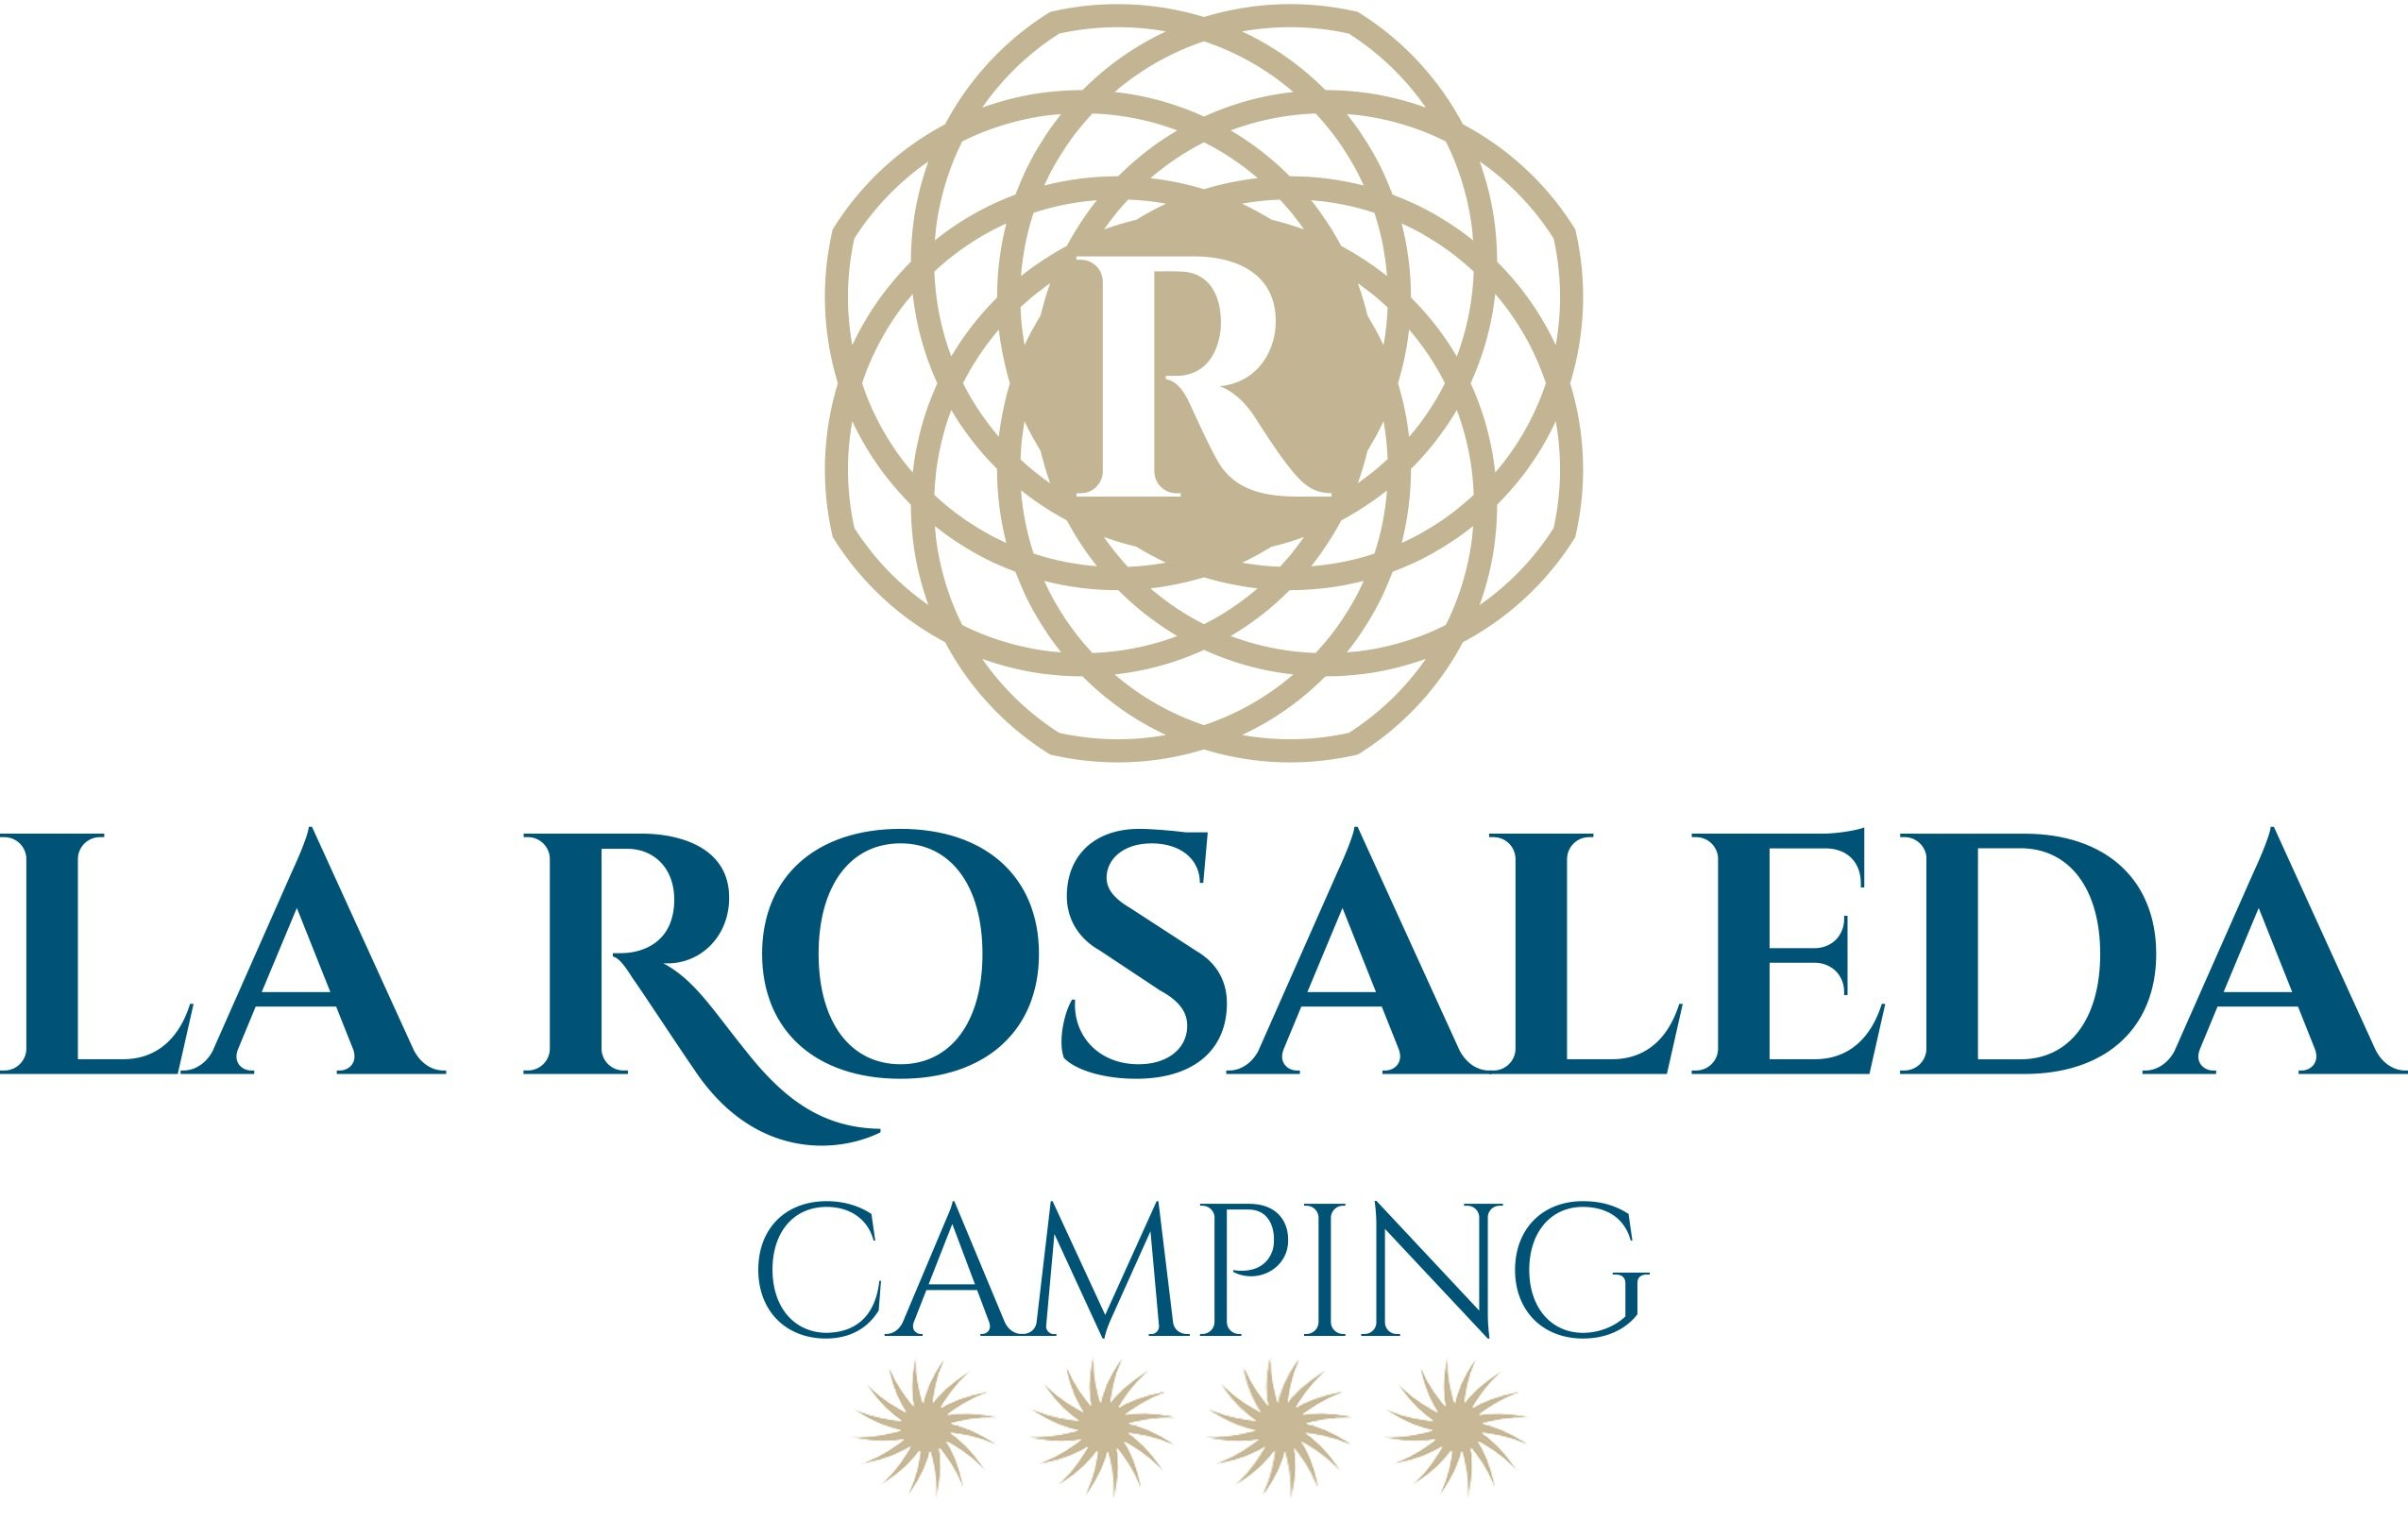 Camping La Rosaleda